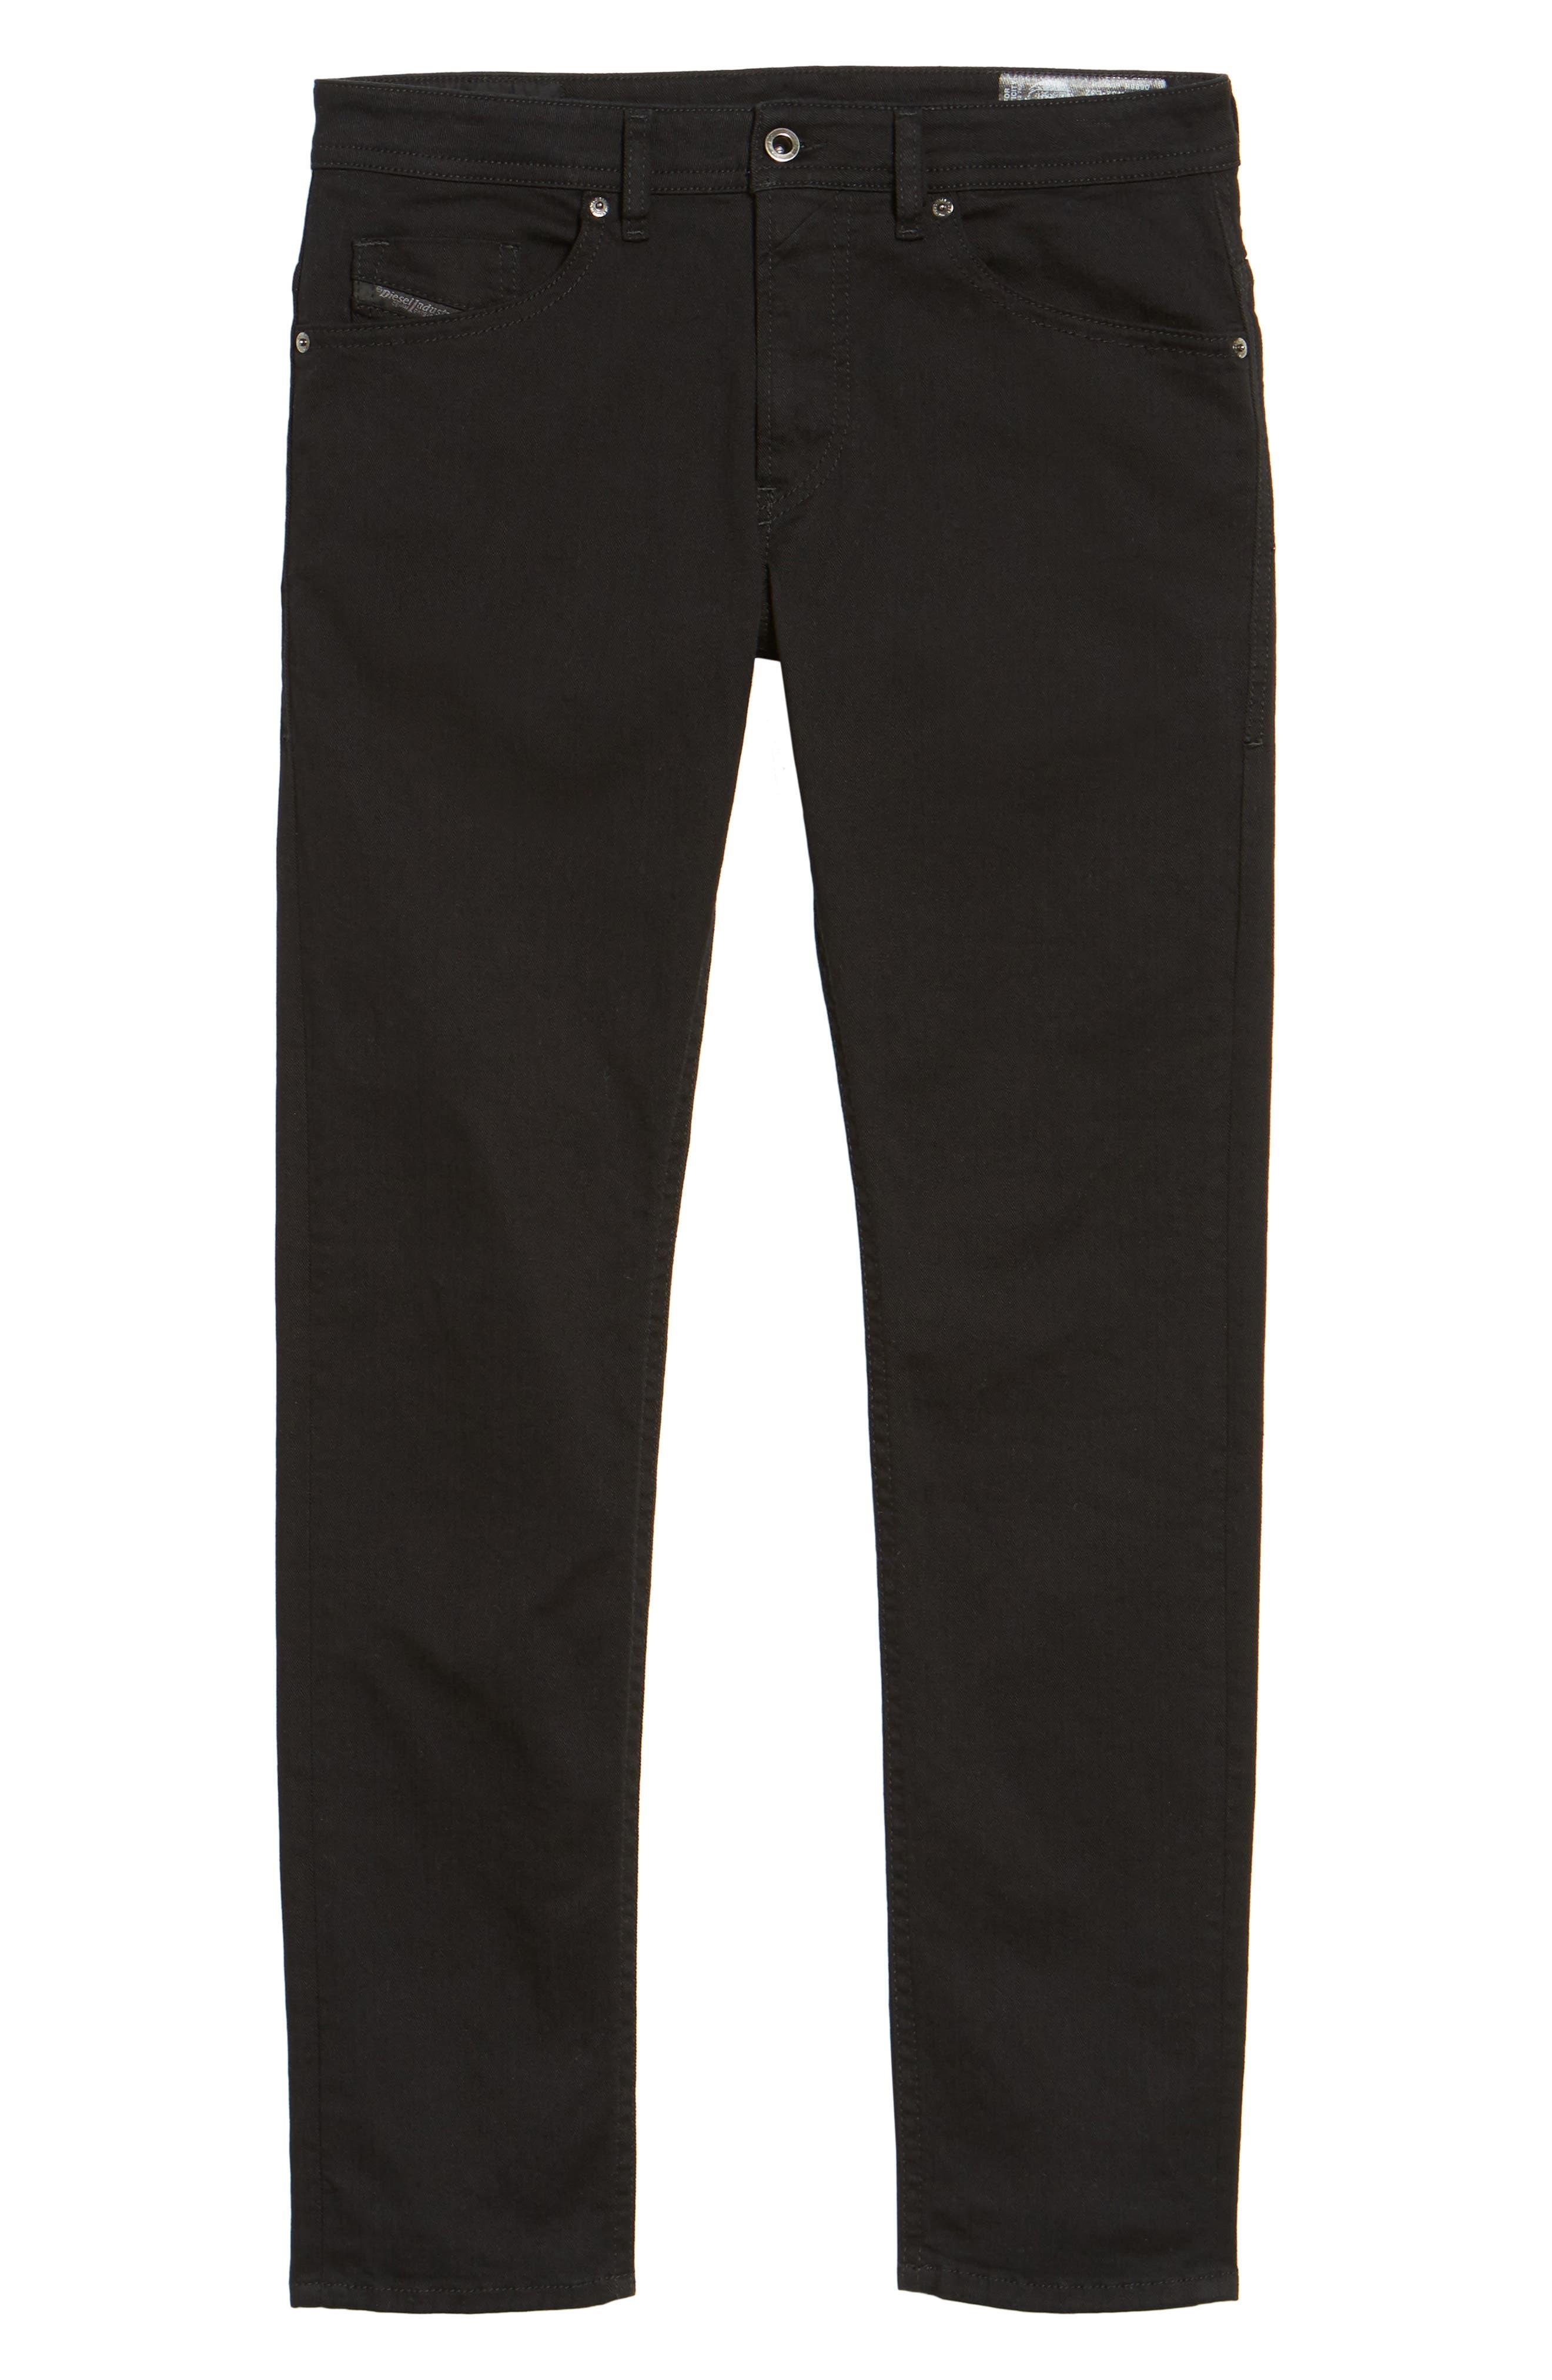 Thommer Slim Fit Jeans,                             Alternate thumbnail 6, color,                             BLACK/ DENIM